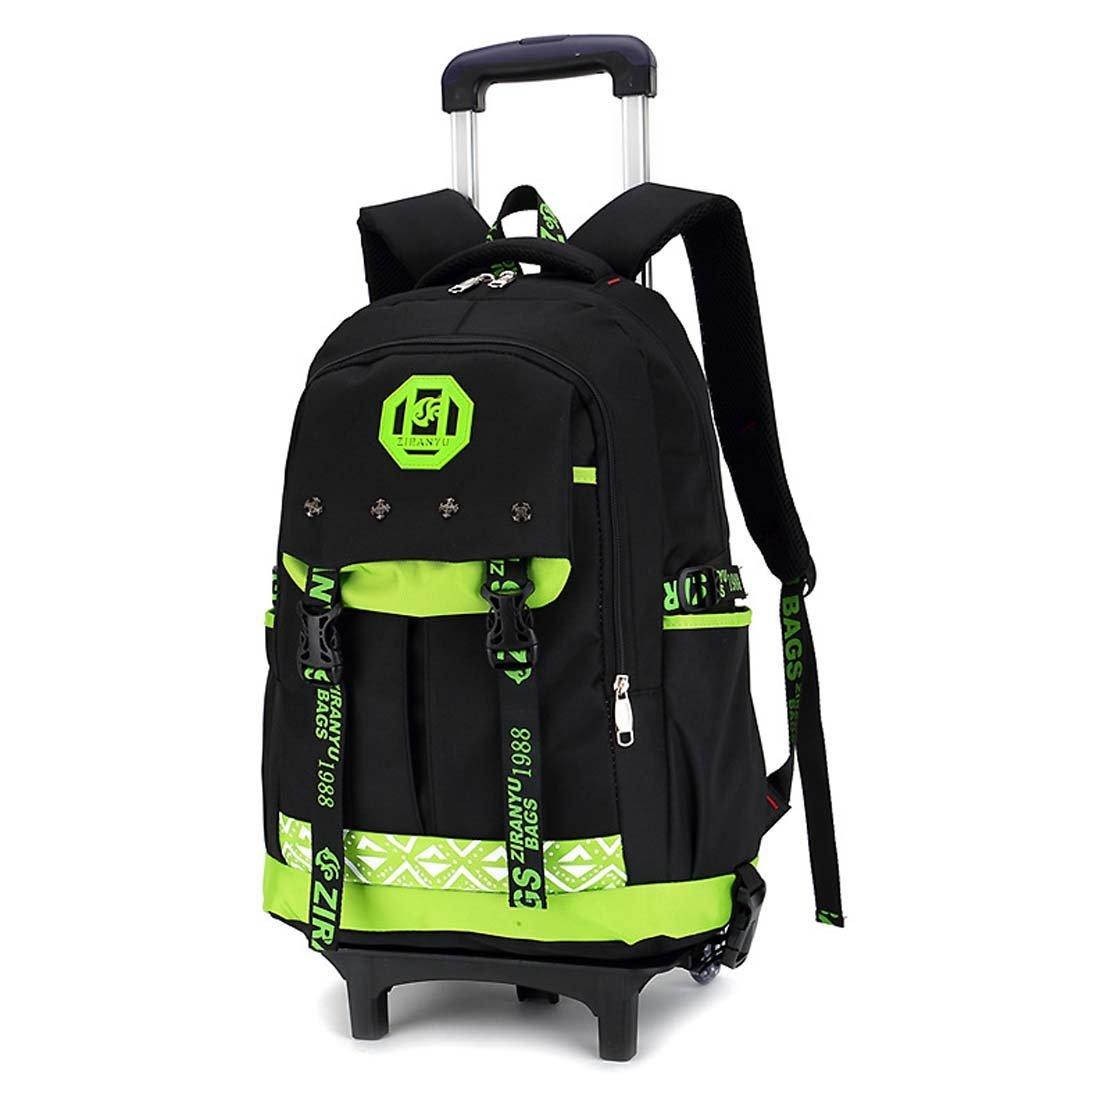 a3570f5b197 Get Quotations · HIGOGOGO Middle School Student Removable Hand Trolley  Luggage Backpack Boy Trolley School Bags,Teen Boys